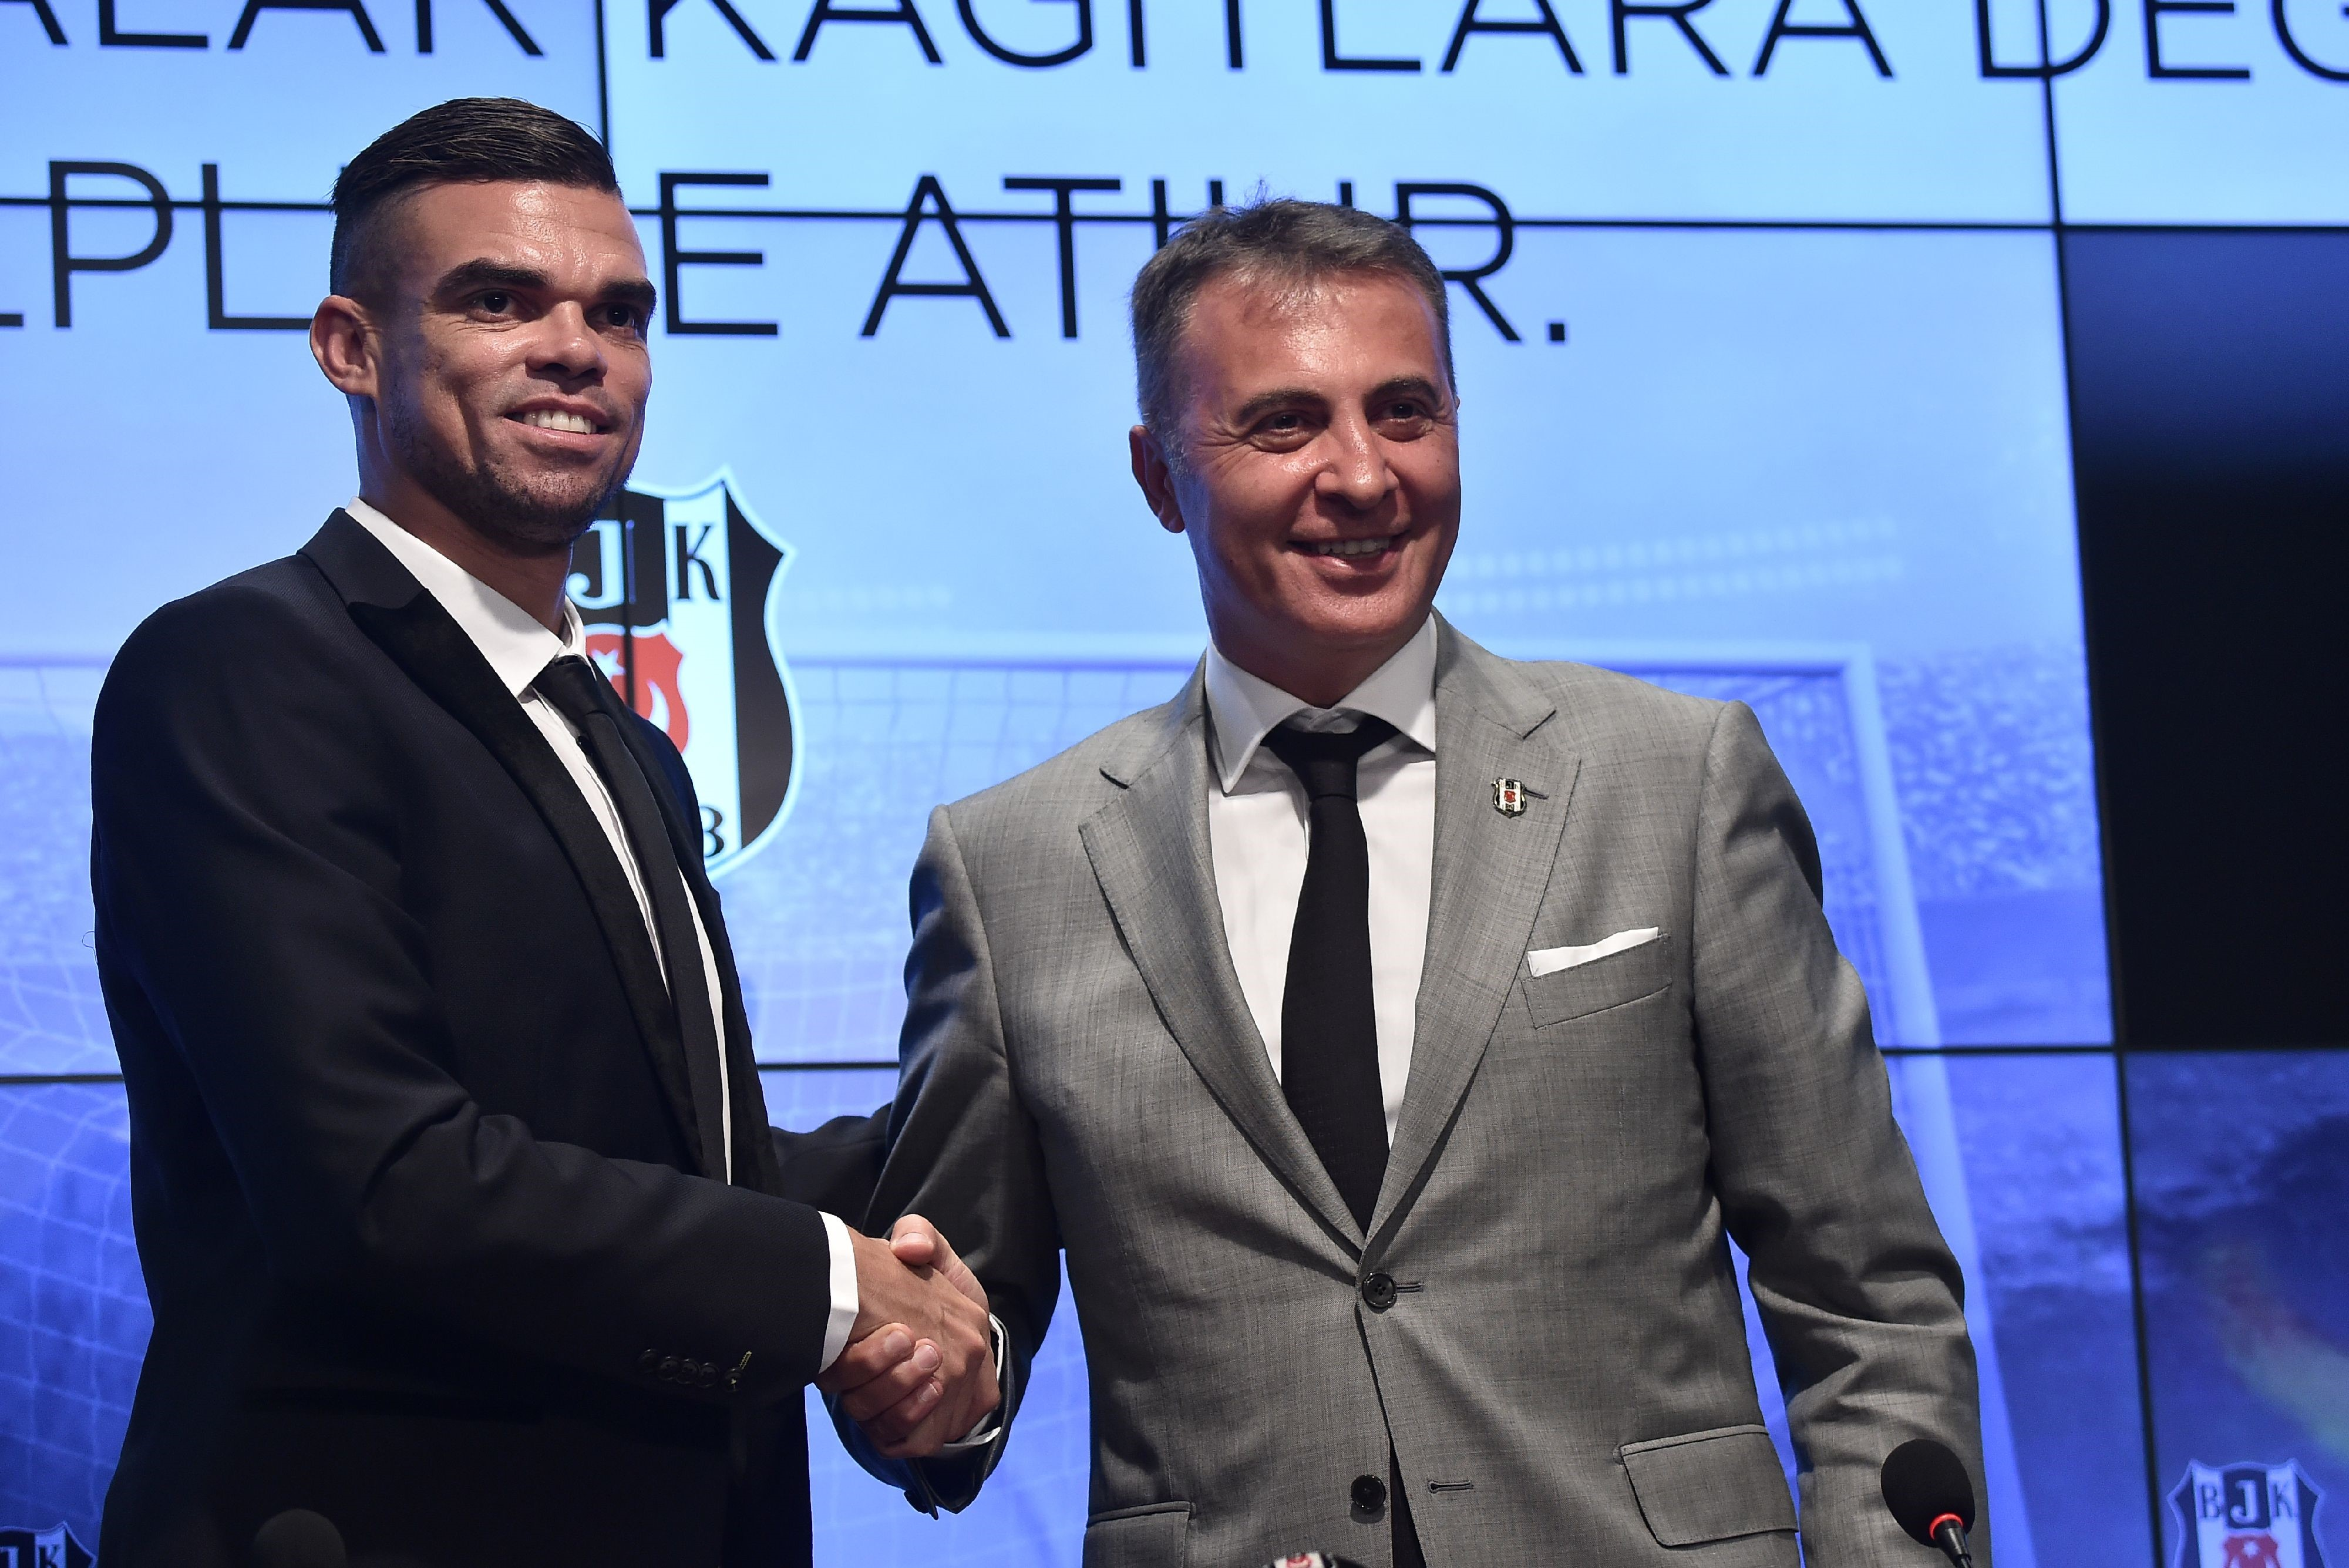 https://i.eurosport.com/2017/08/02/2137844.jpg